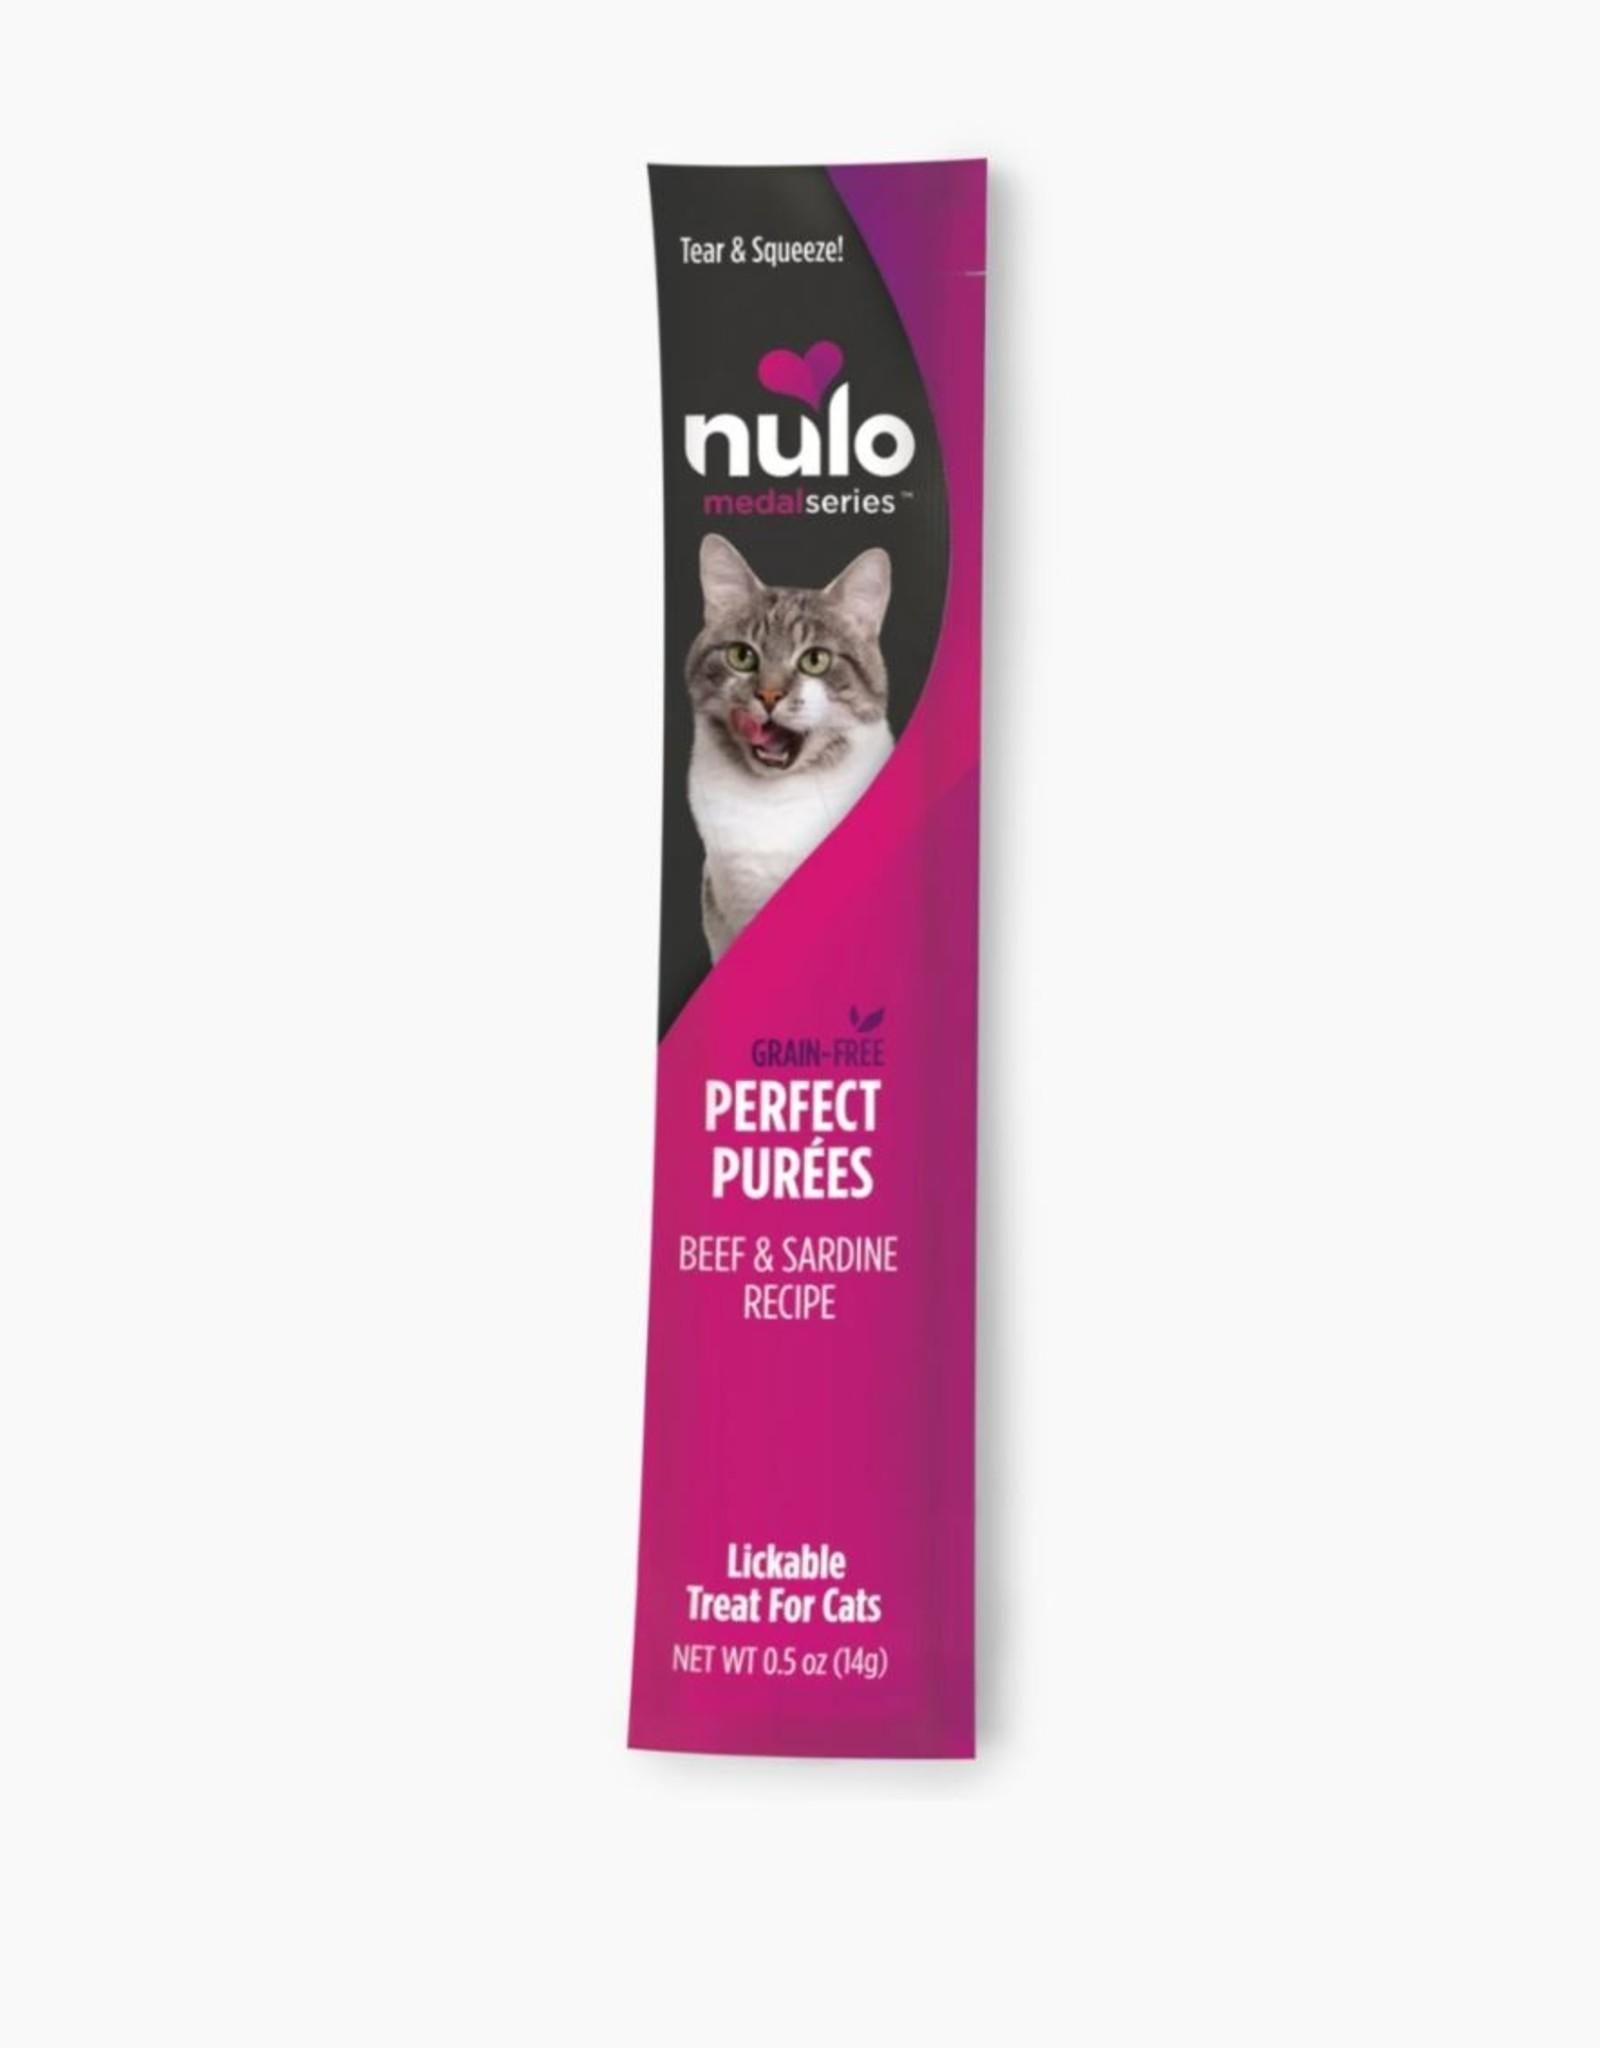 Nulo Grain-Free Perfect Purees Beef & Sardine .5 oz